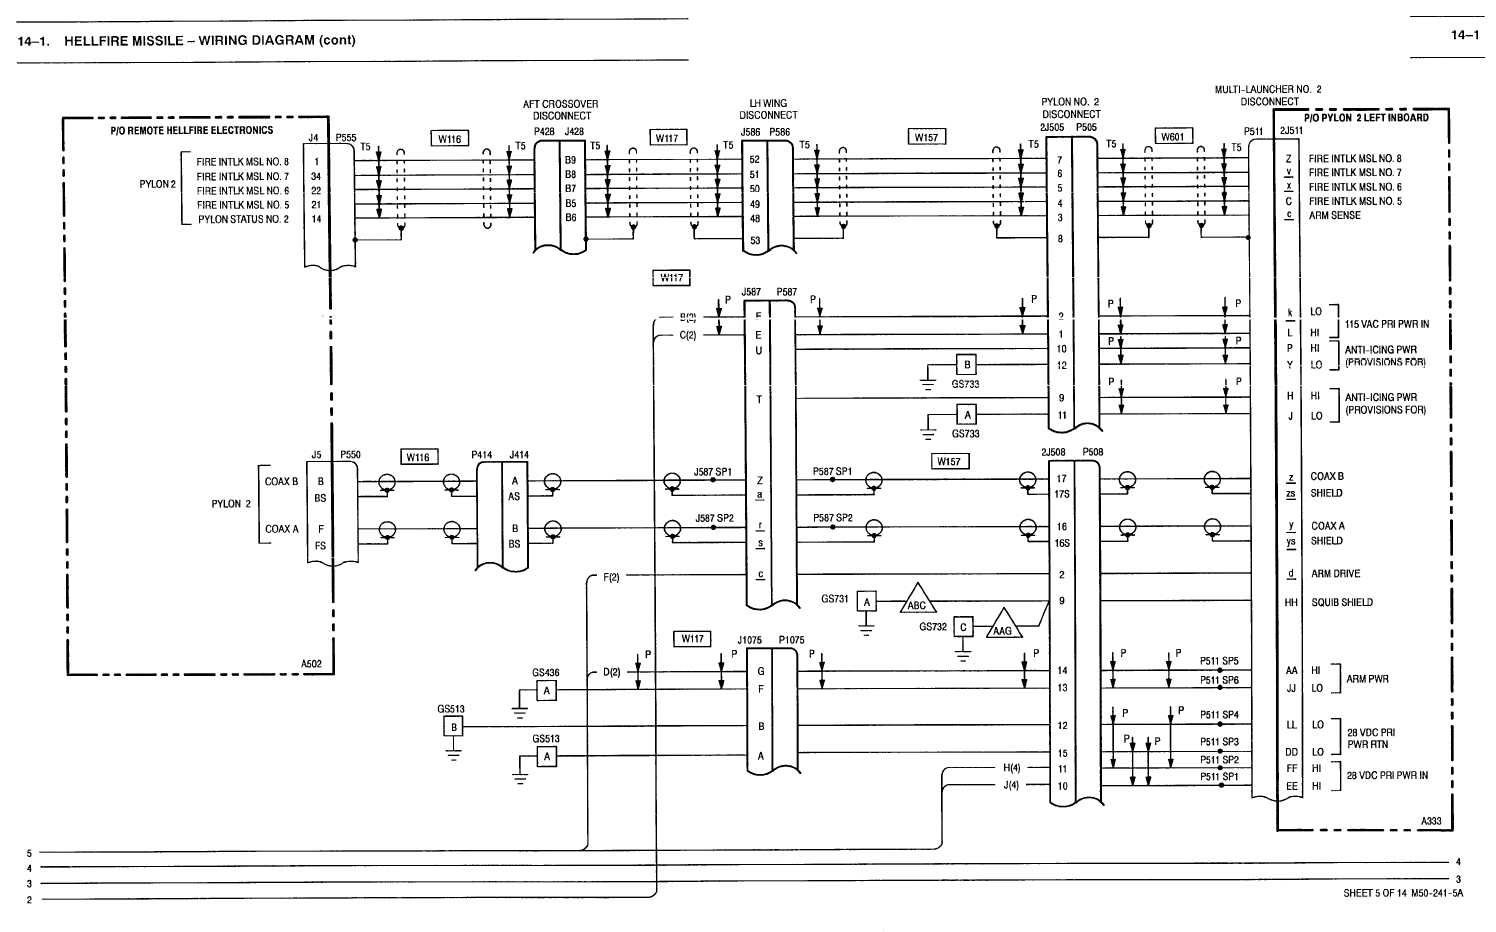 141 HELLFIRE MISSILE WIRING DIAGRAM CONT TM11520238T10448 – Iris Wiring Diagram